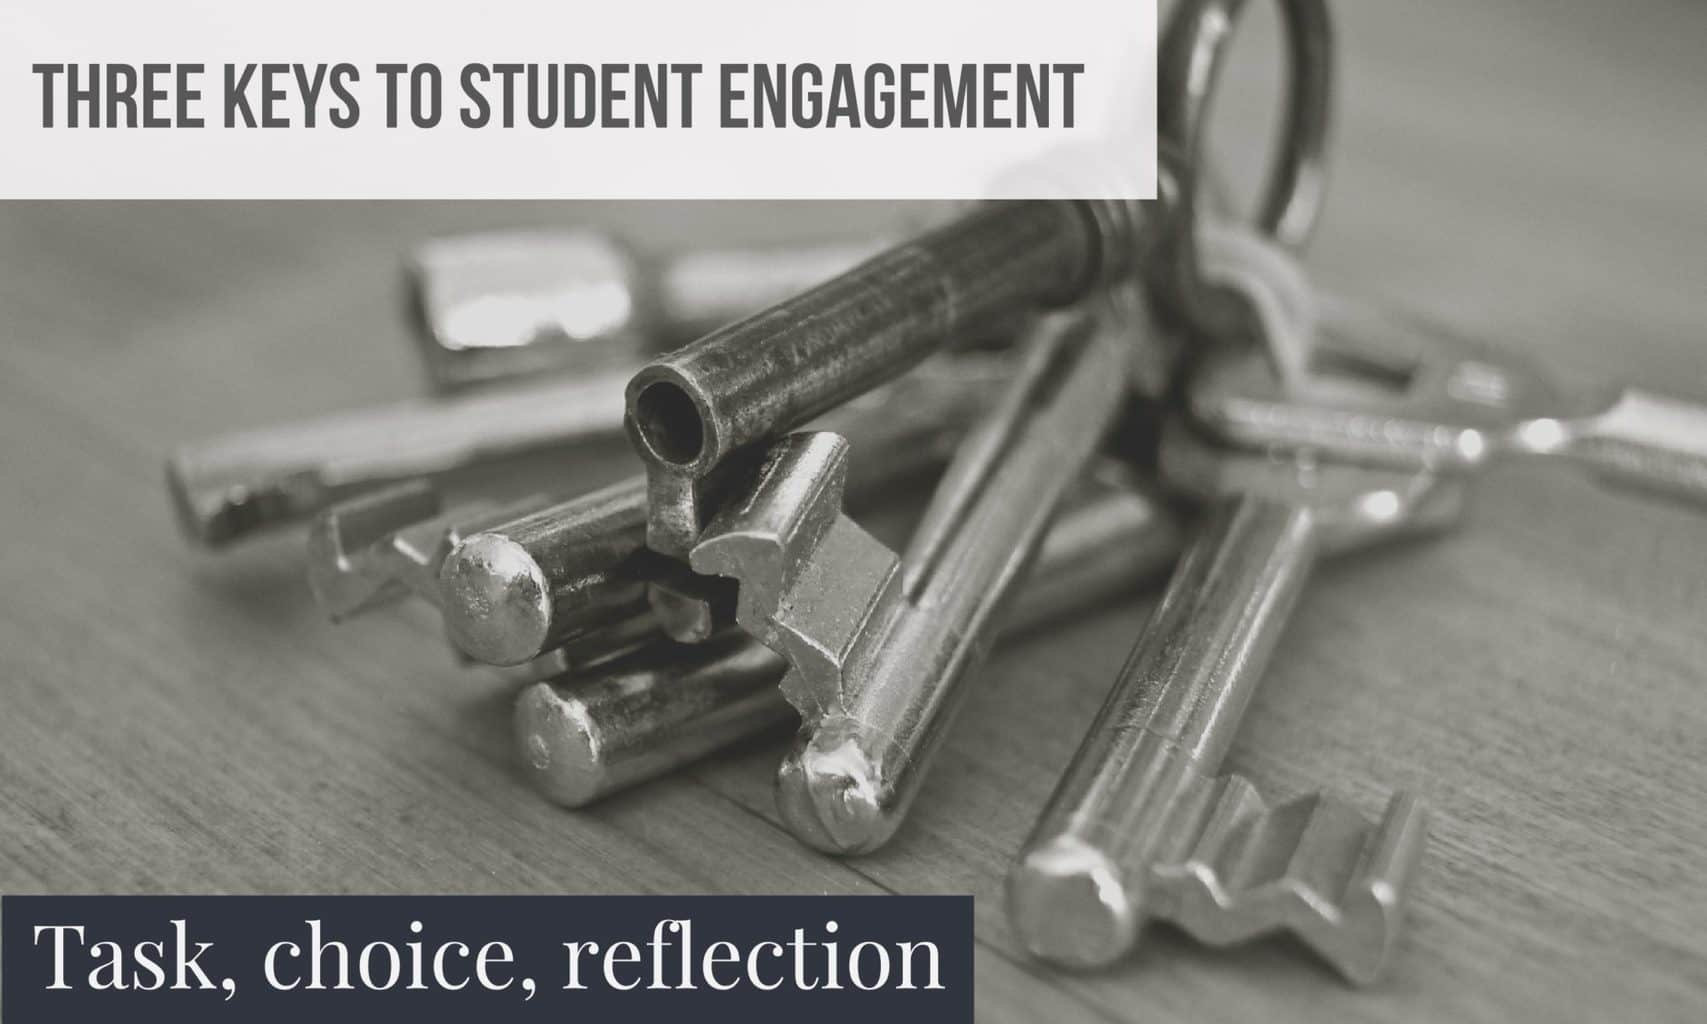 Three keys to student engagement